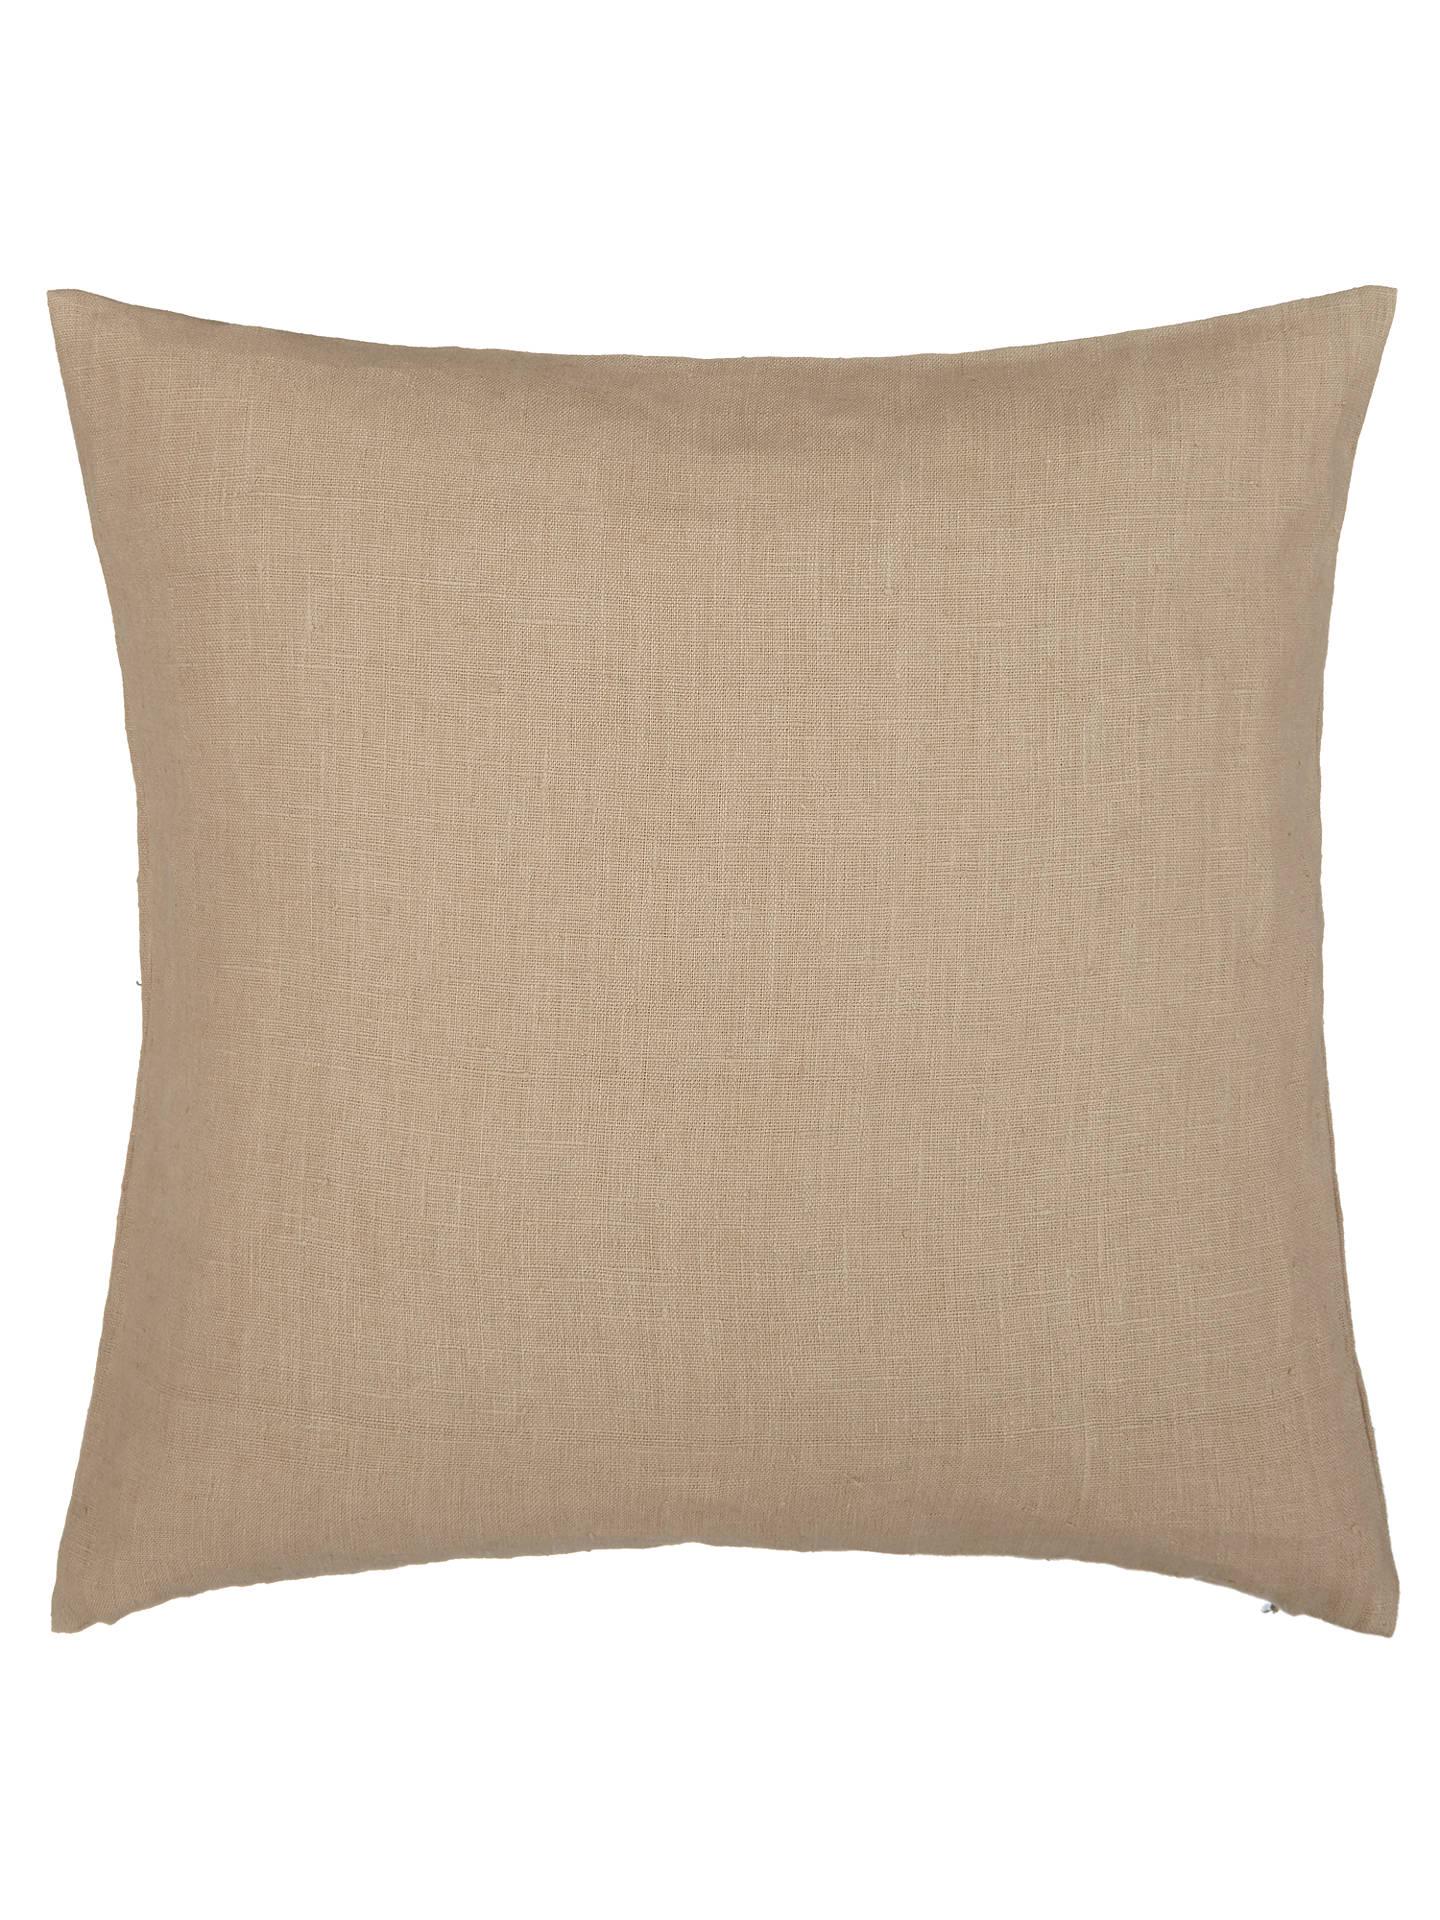 john lewis partners linen cushion at john lewis partners. Black Bedroom Furniture Sets. Home Design Ideas